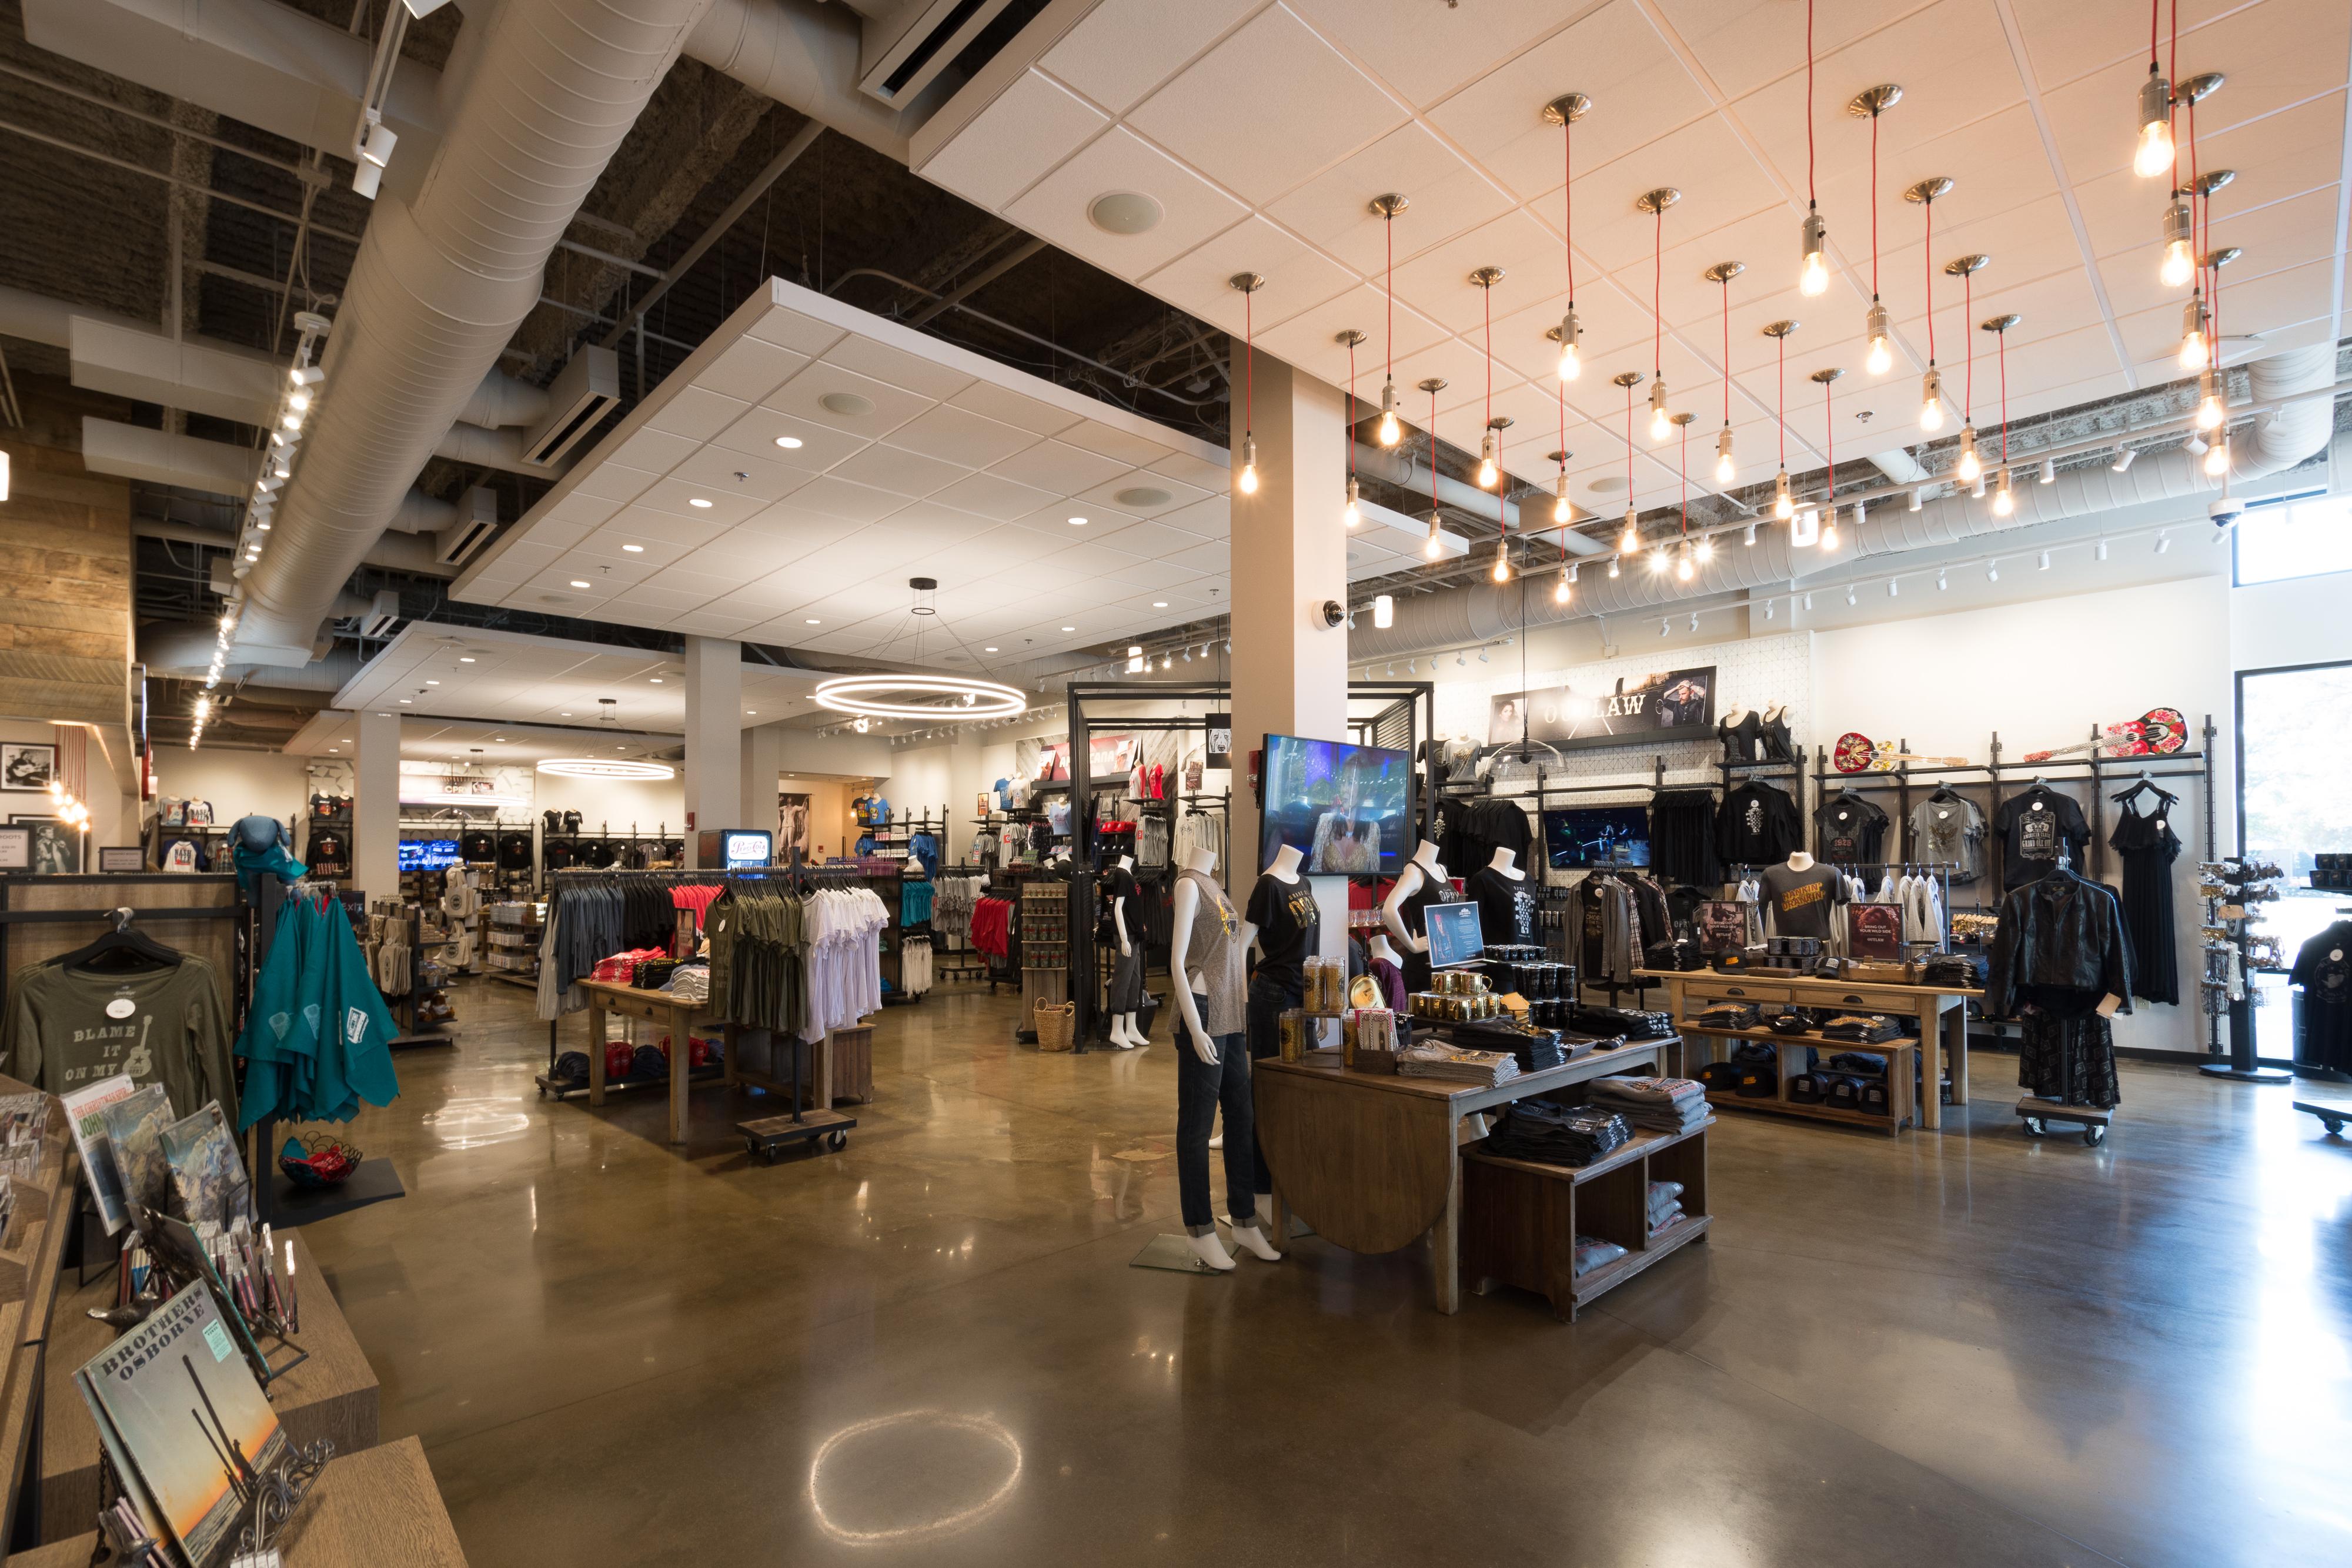 Jnj My Store >> The Opry Shop J J Interiors Inc